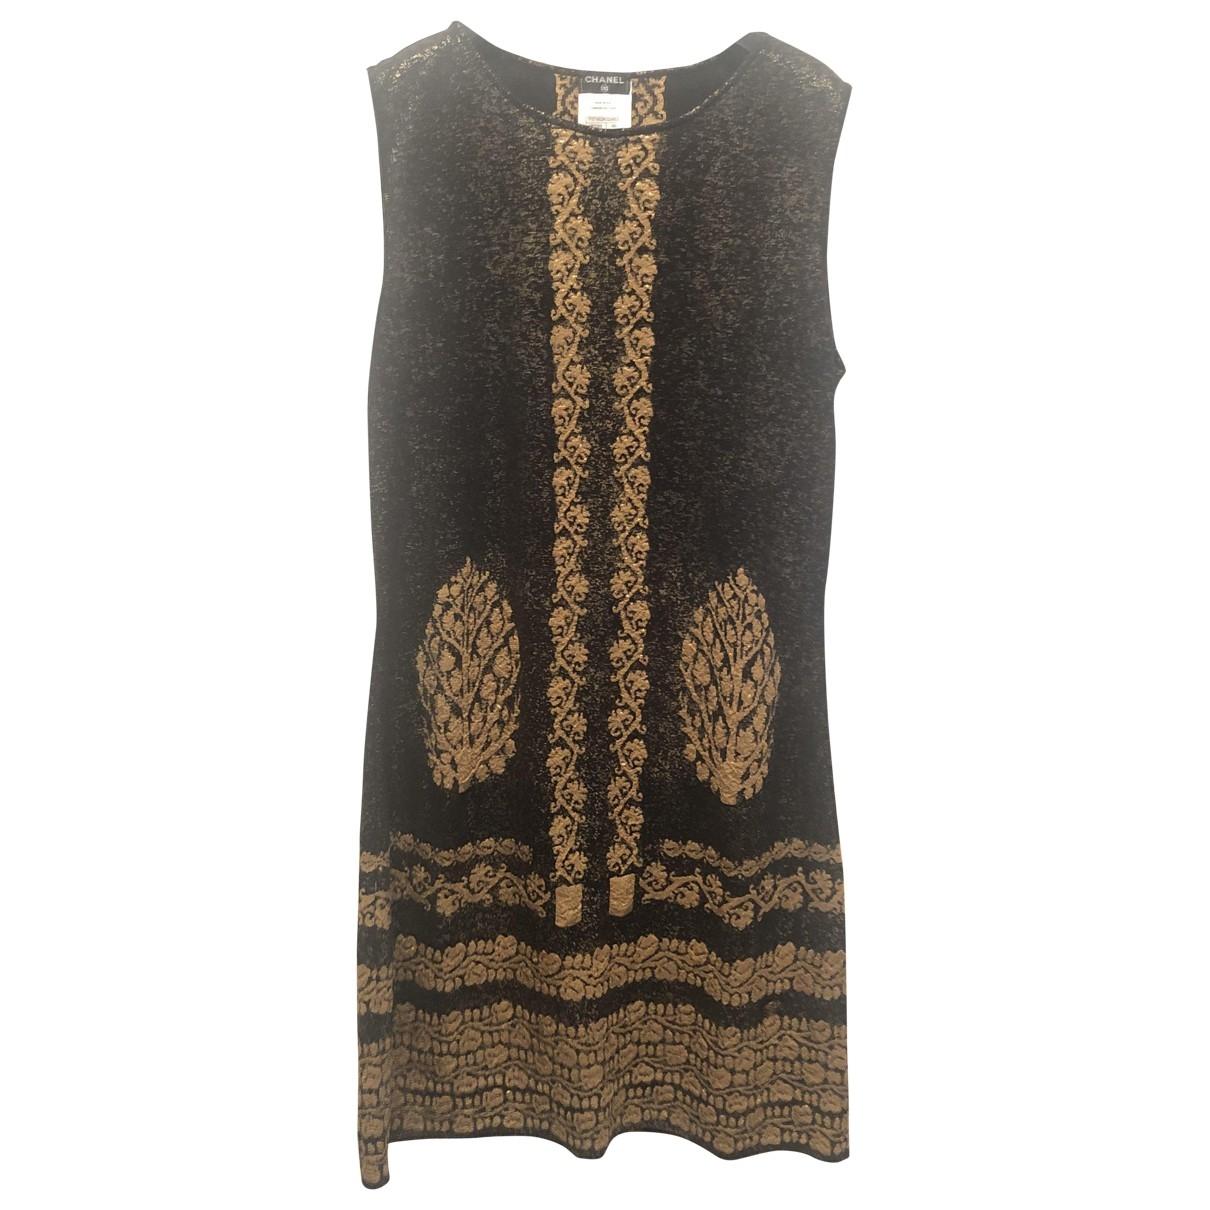 Chanel \N Black Cotton dress for Women 40 FR